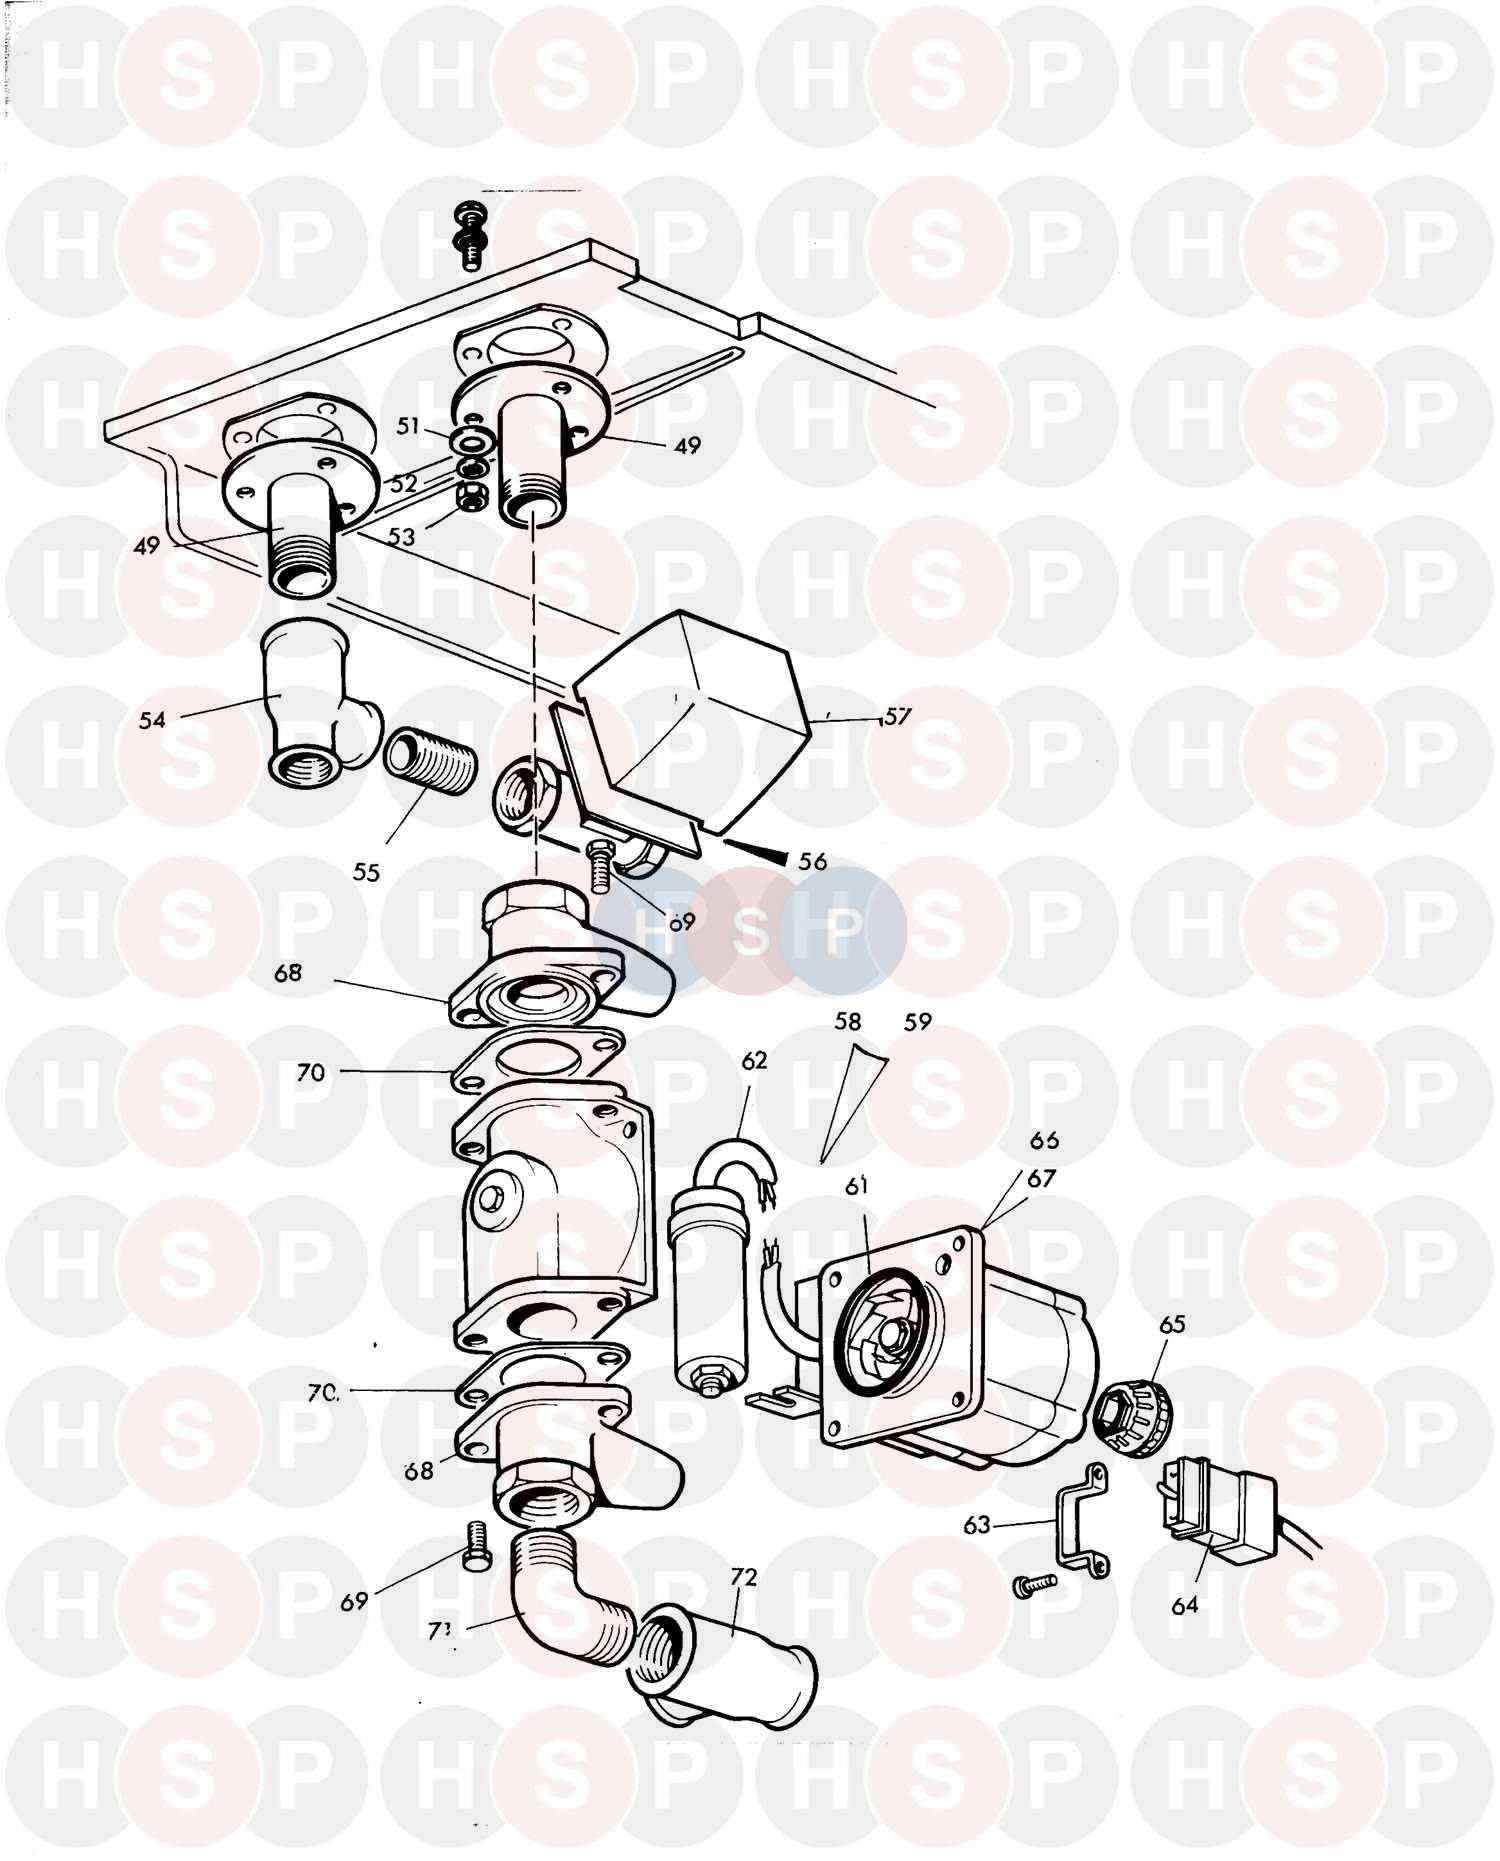 Potterton FRS 52 (LATE MODEL) (ASSEMBLY 1) Diagram